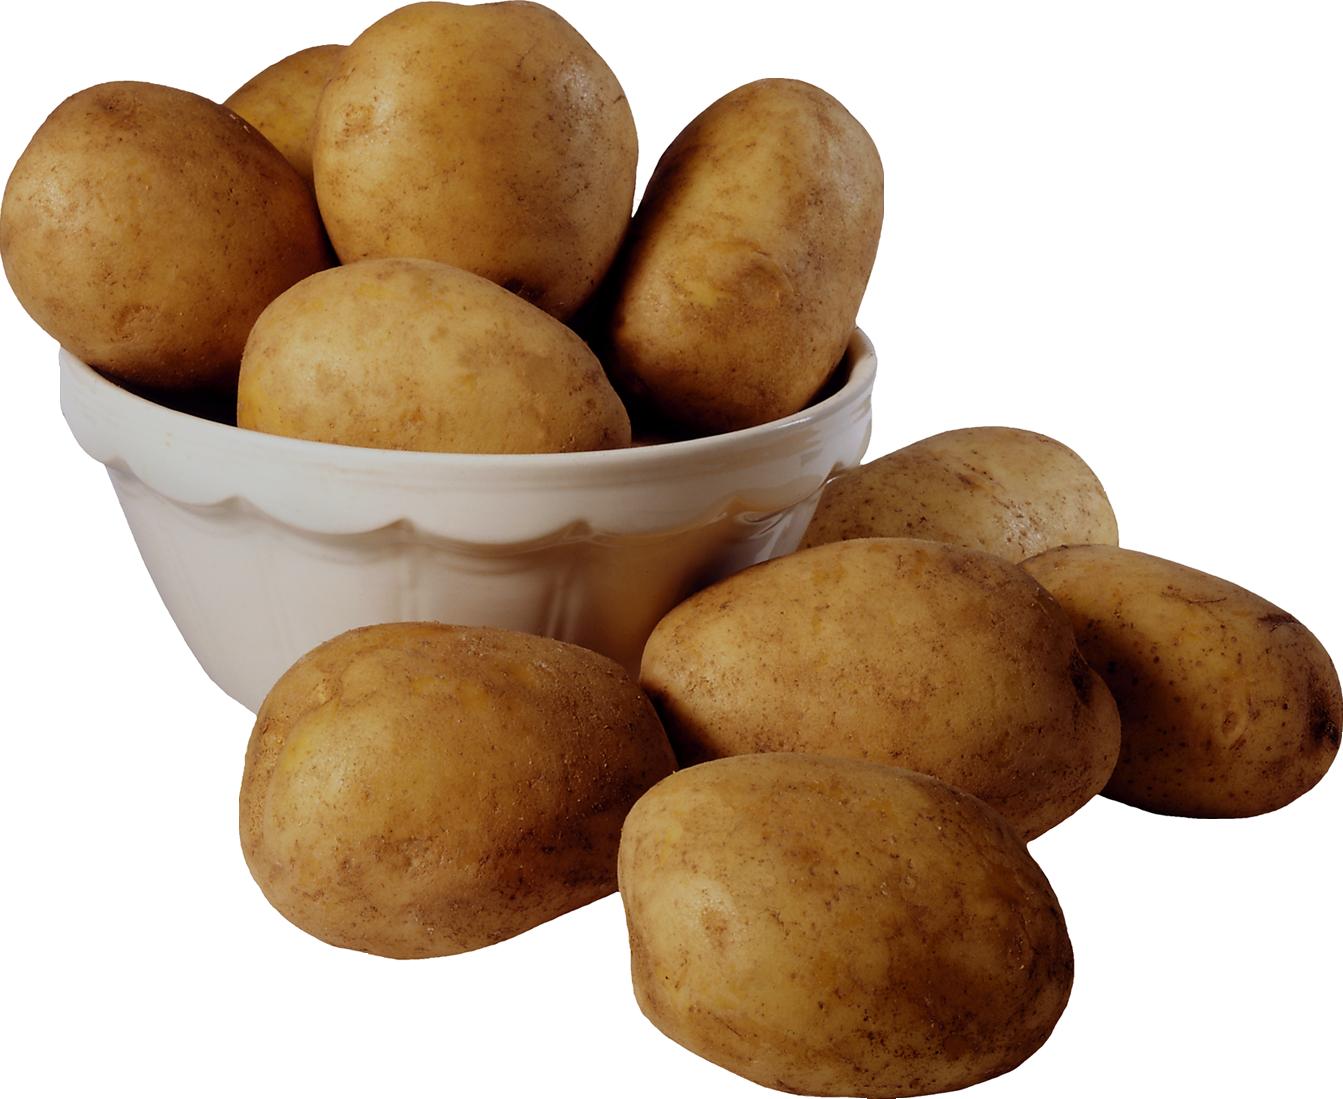 Png image purepng free. Potato clipart russet